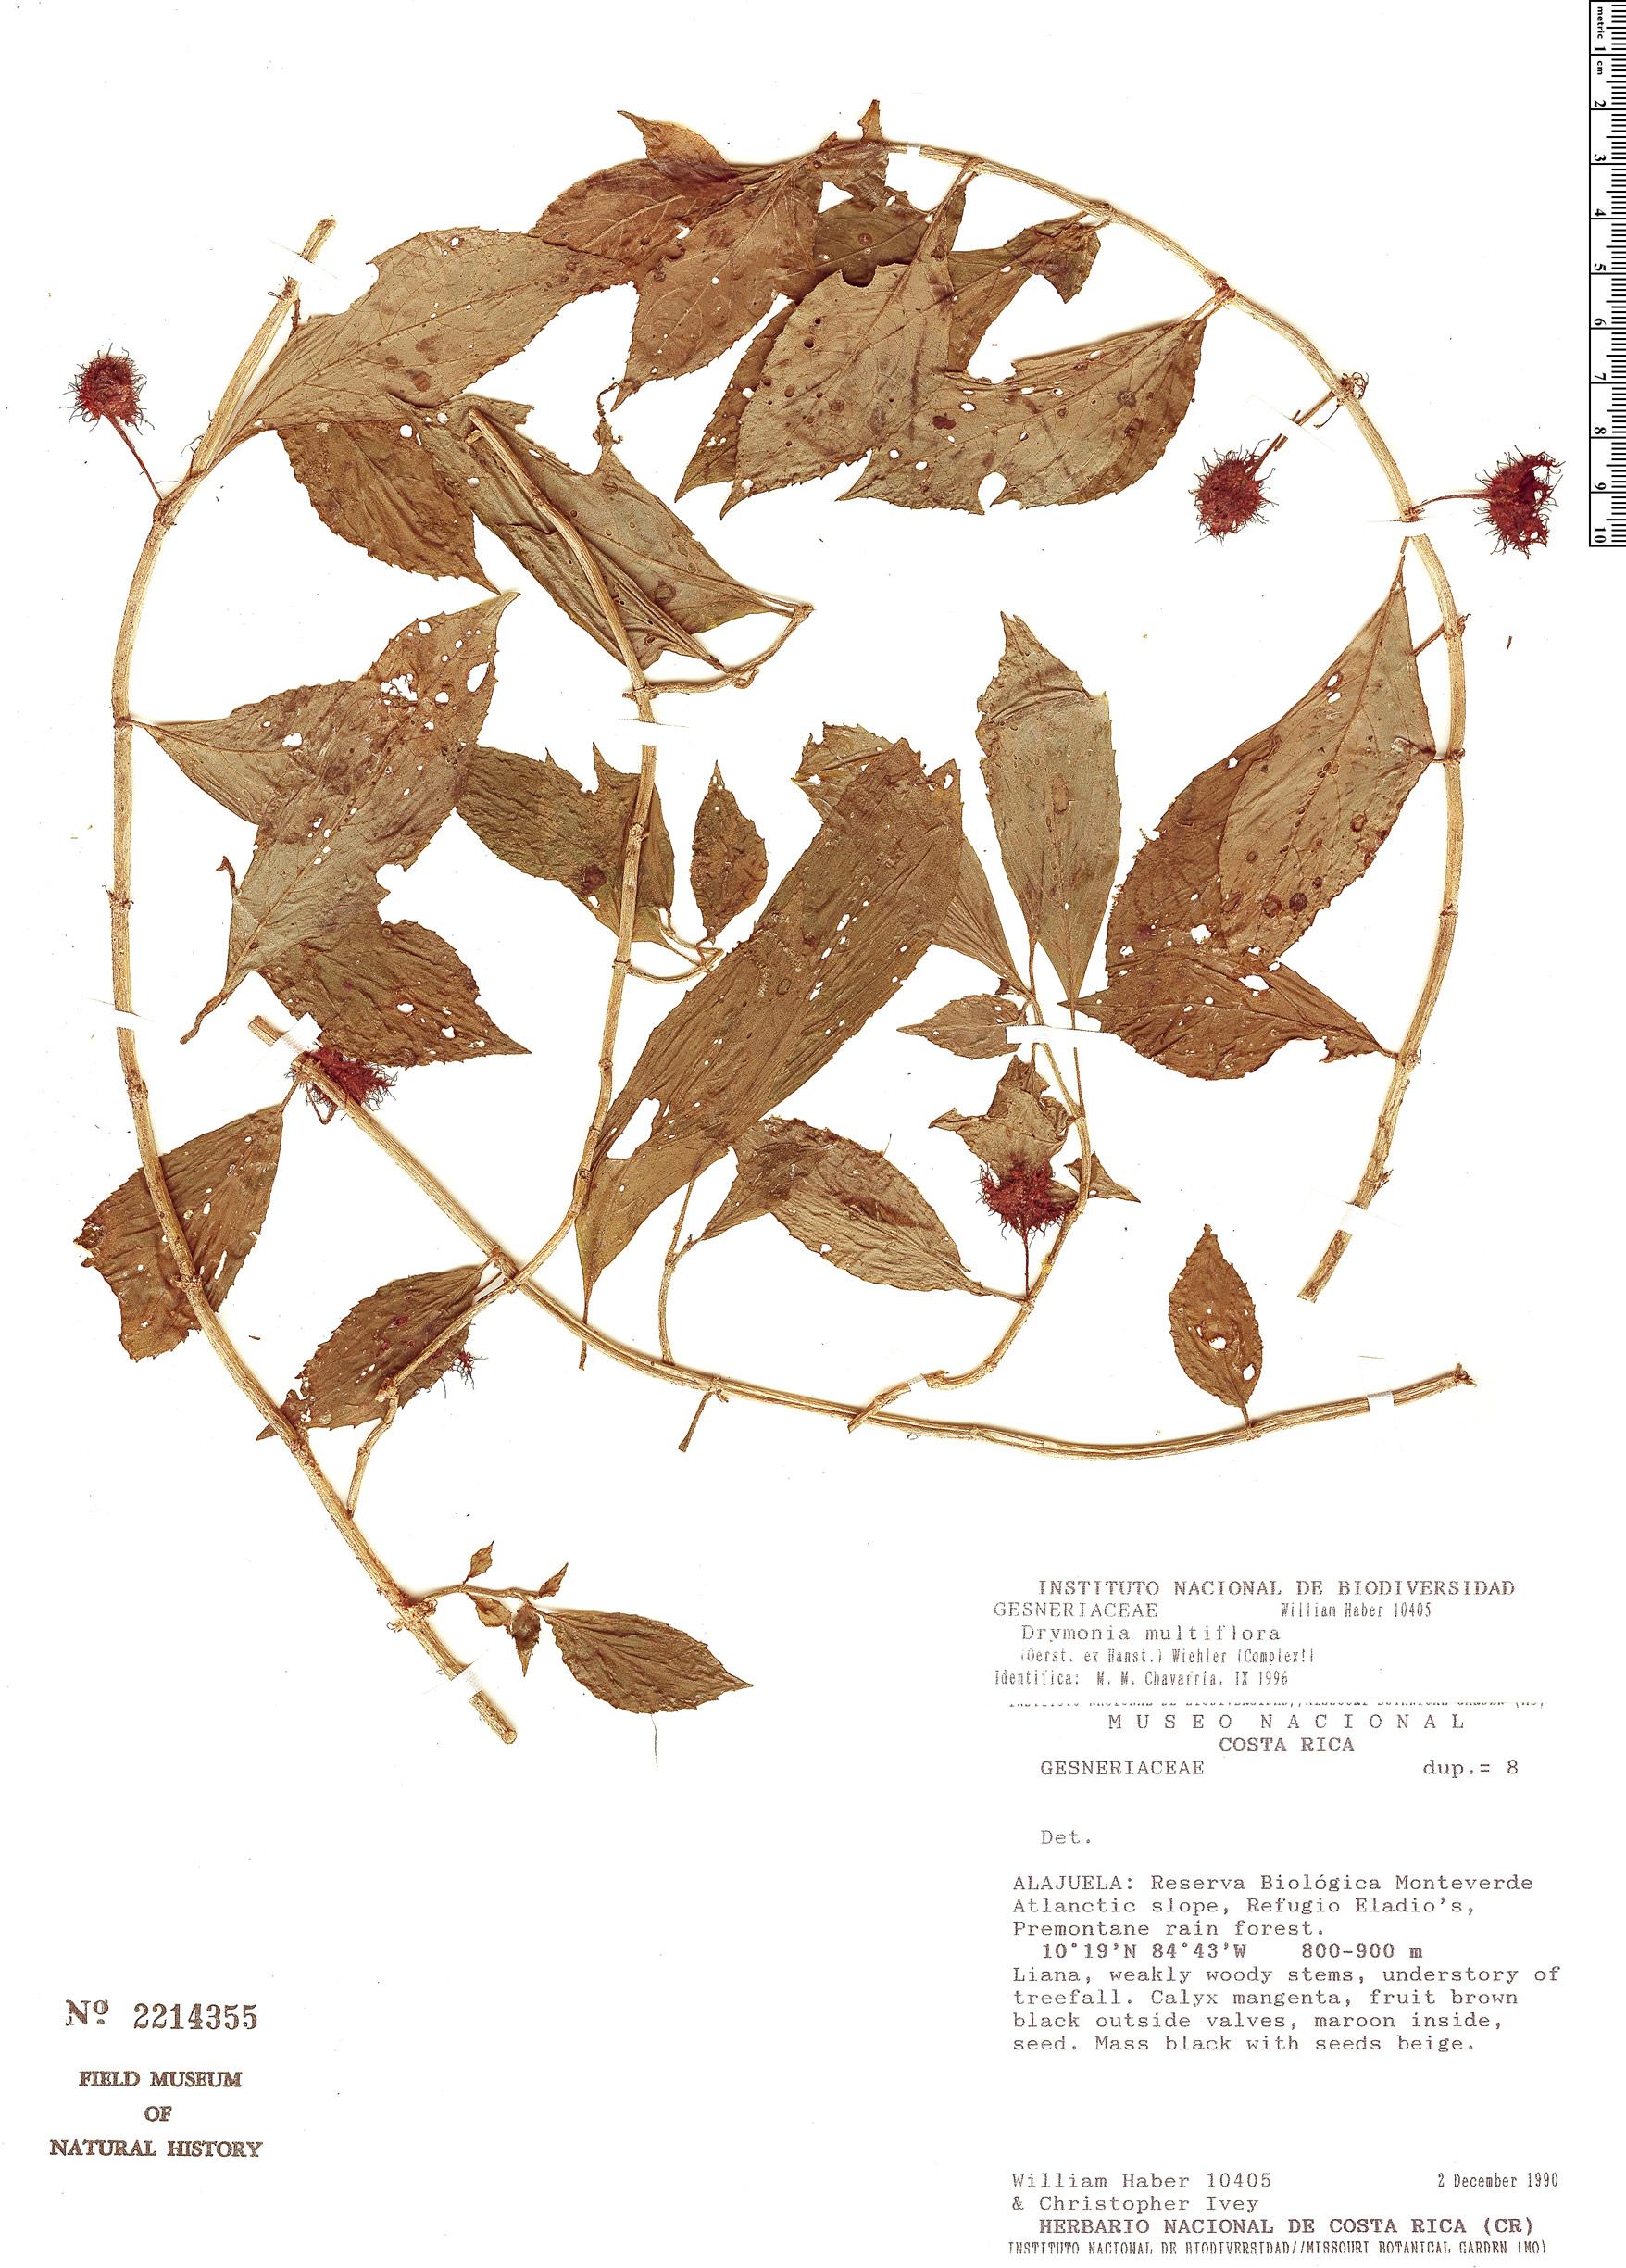 Specimen: Drymonia multiflora